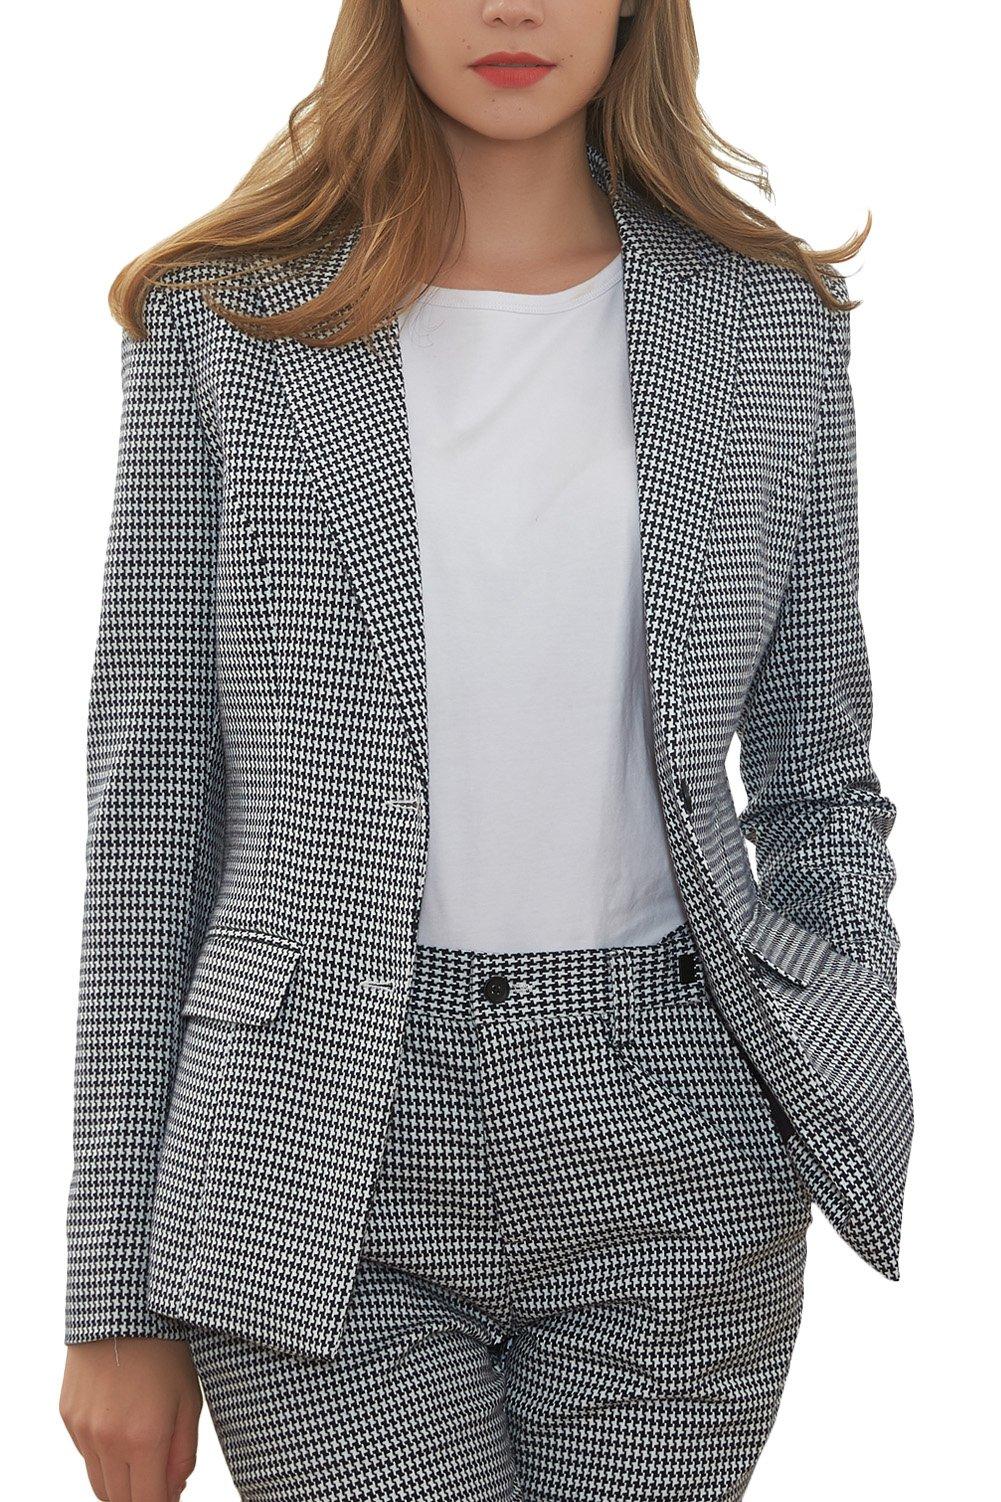 Hanayome Women's Blazer Business 2-Piece Suit Formal Office Suit & Trousers Sets MI2 (Grey, 16W)